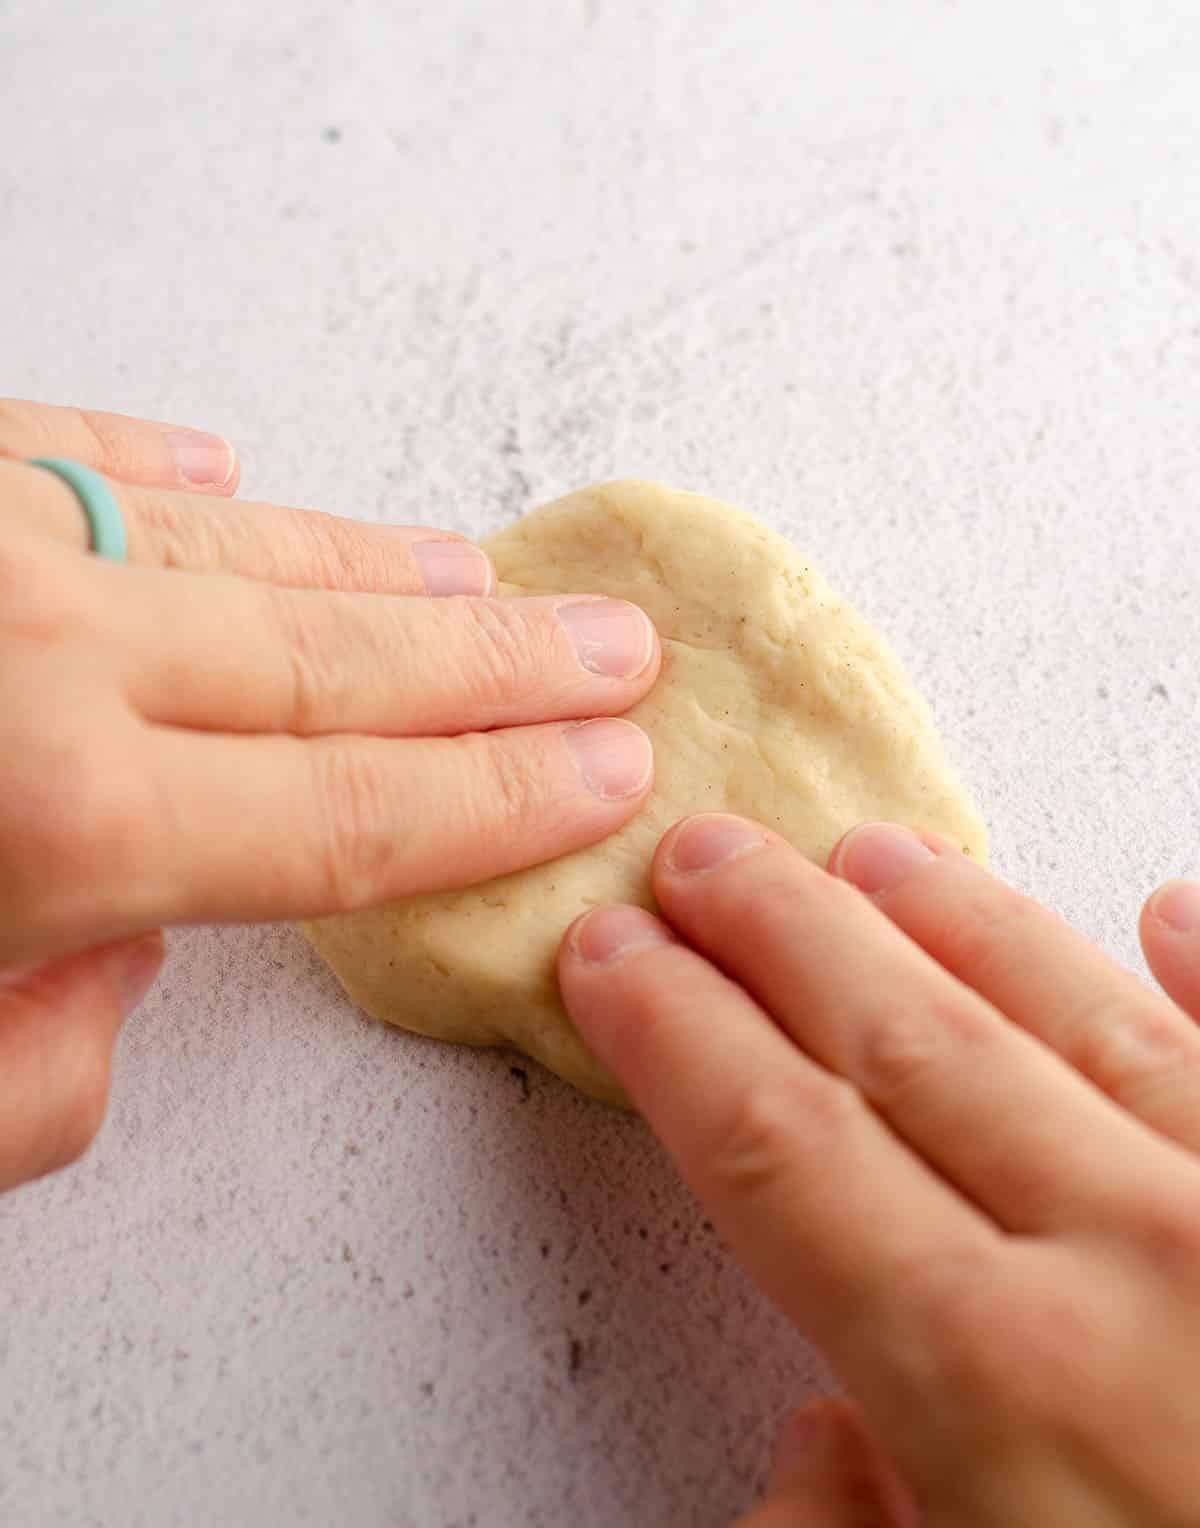 hands forming bread dough into a disc